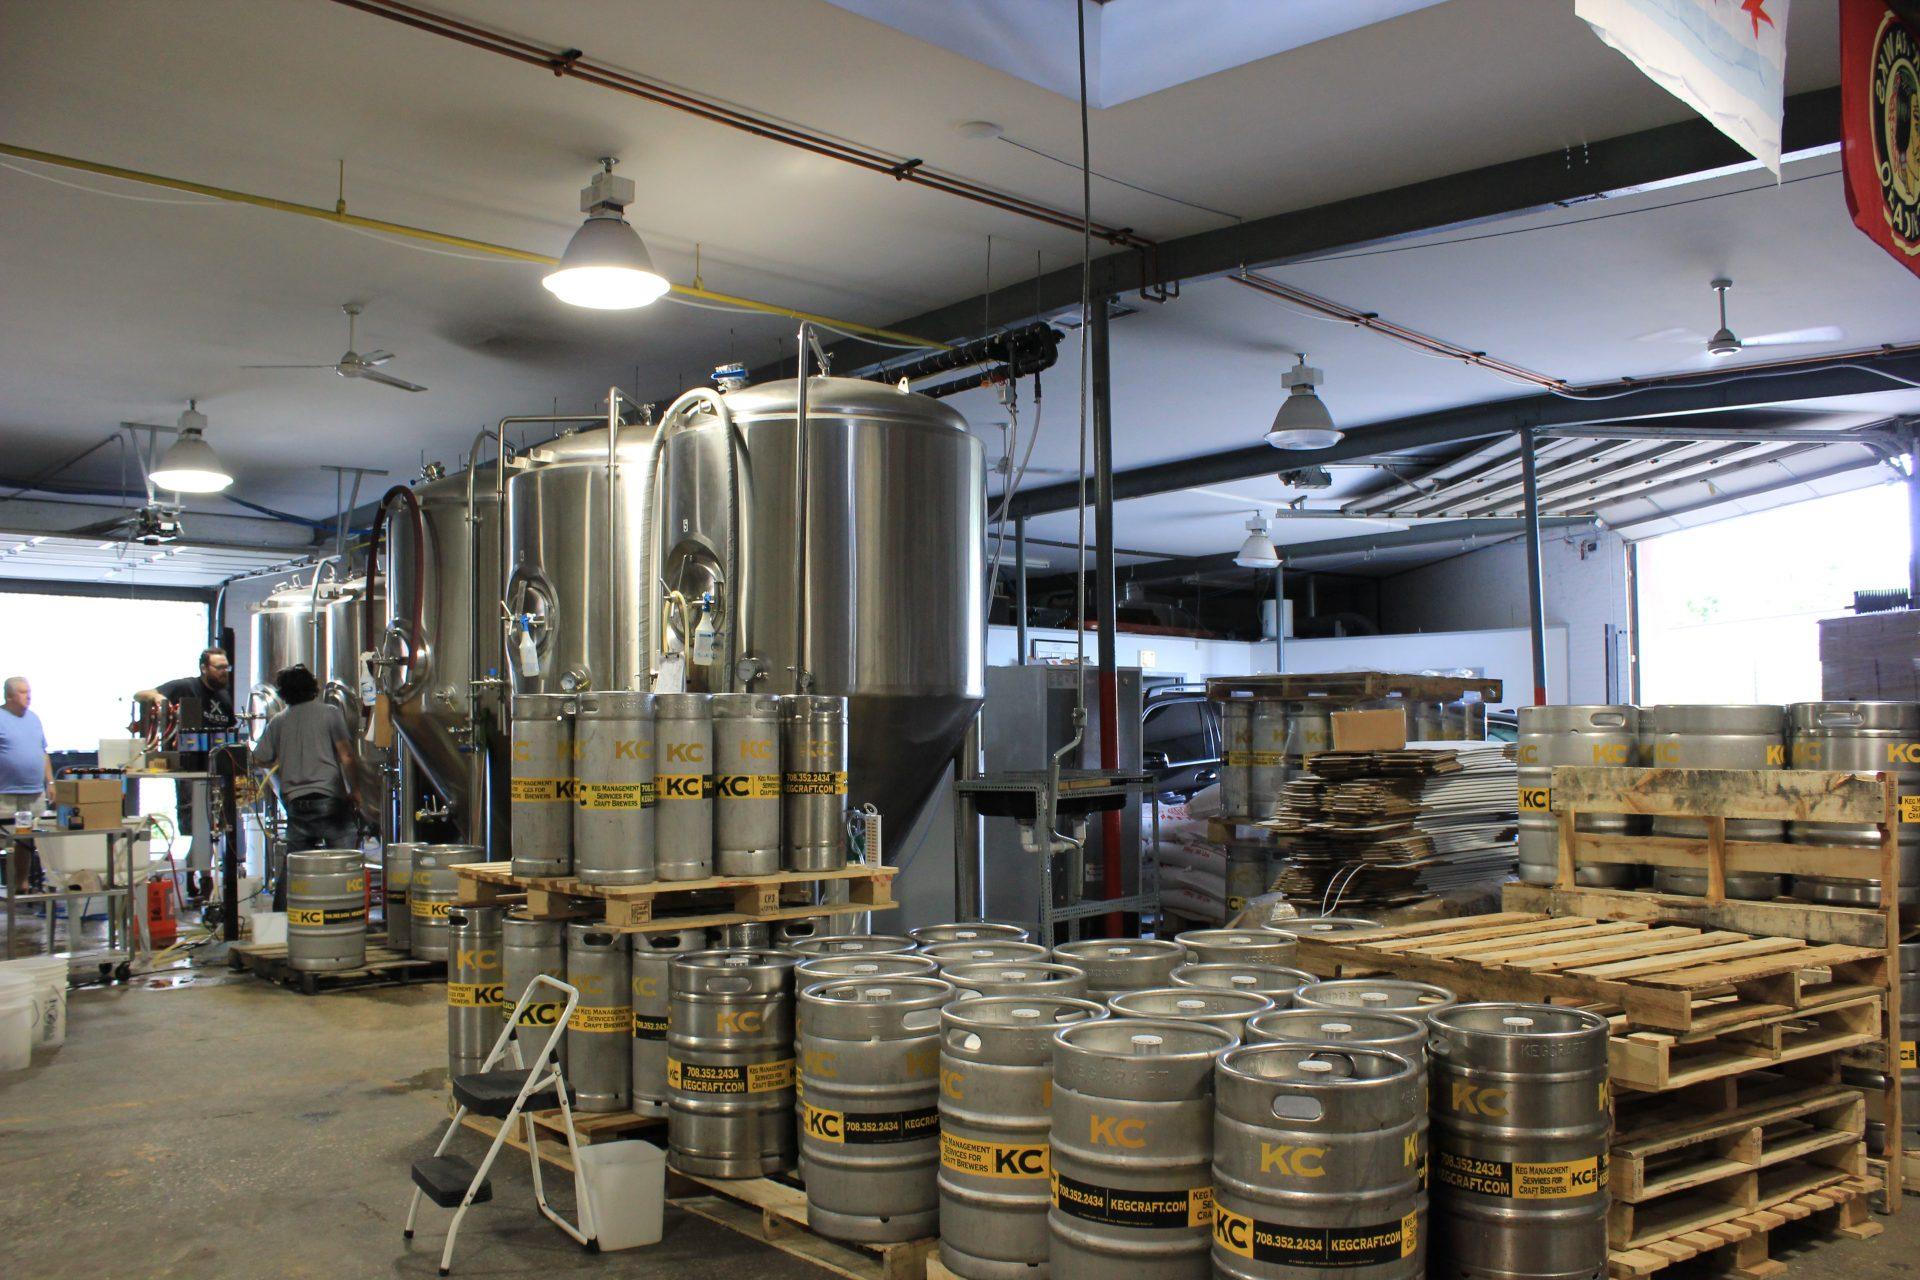 Maplewood Brewery & Distillery